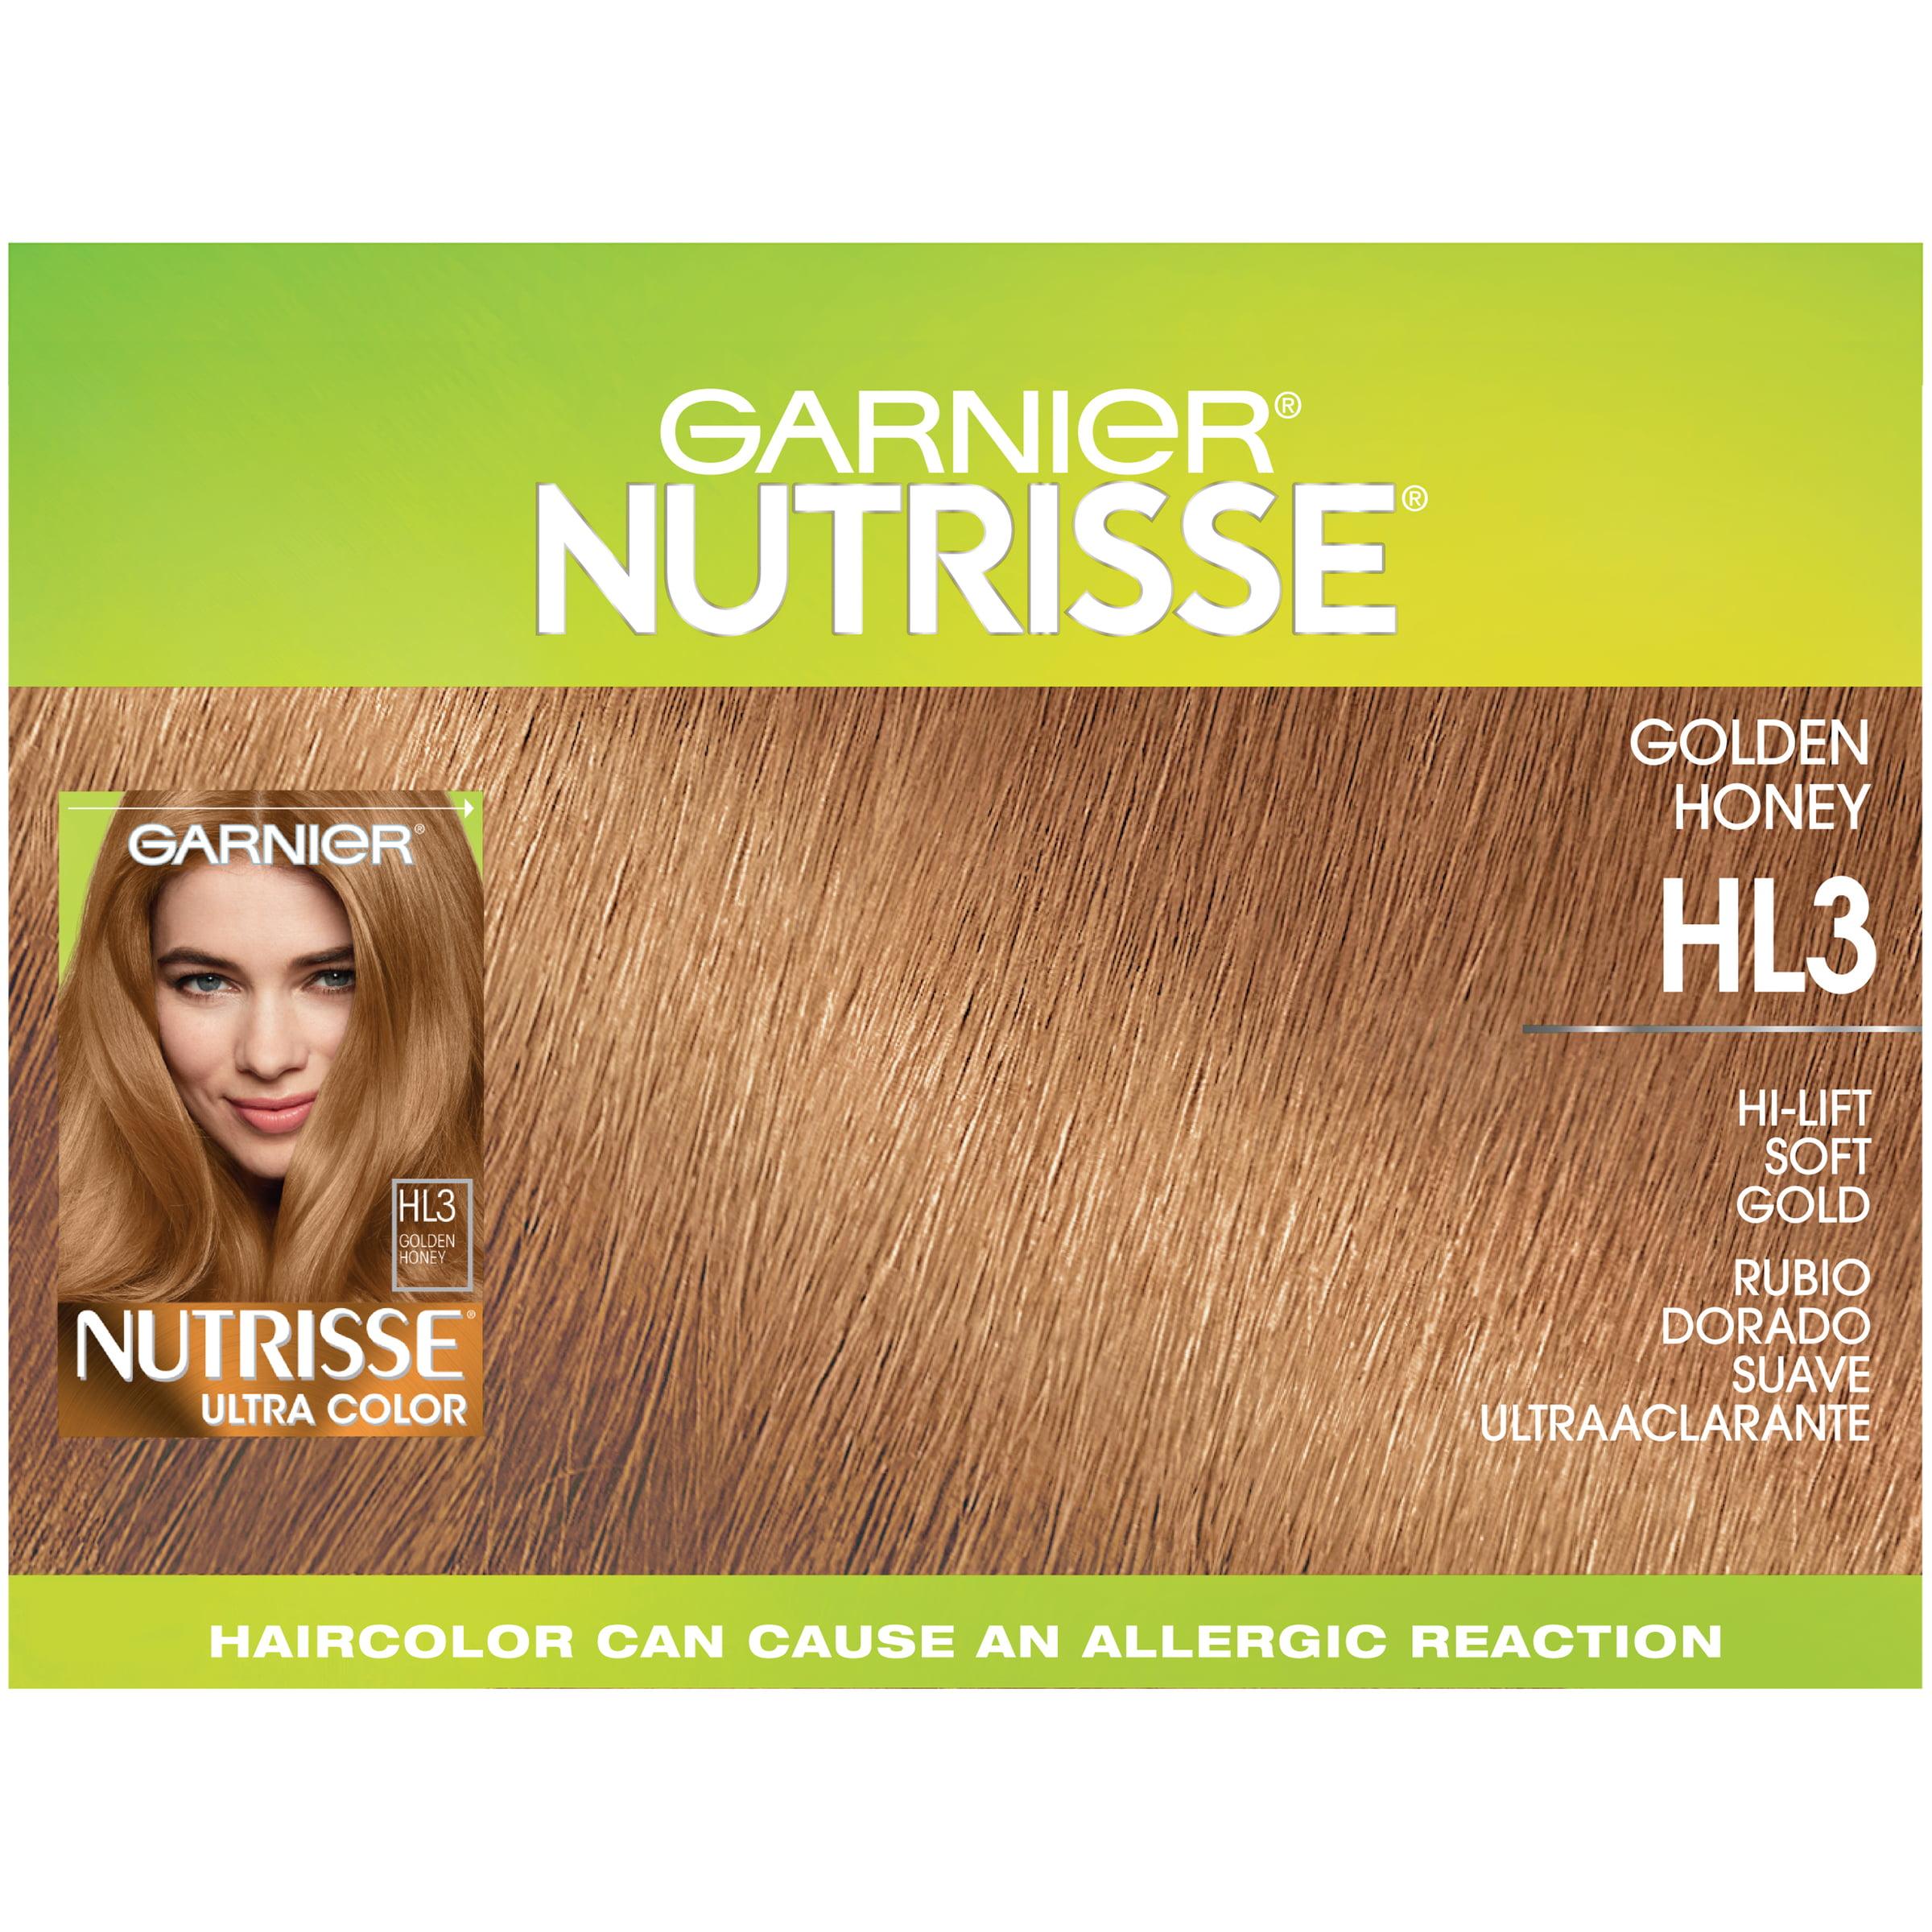 Garnier Nutrisse Ultra Color Nourishing Hair Color Creme Walmart